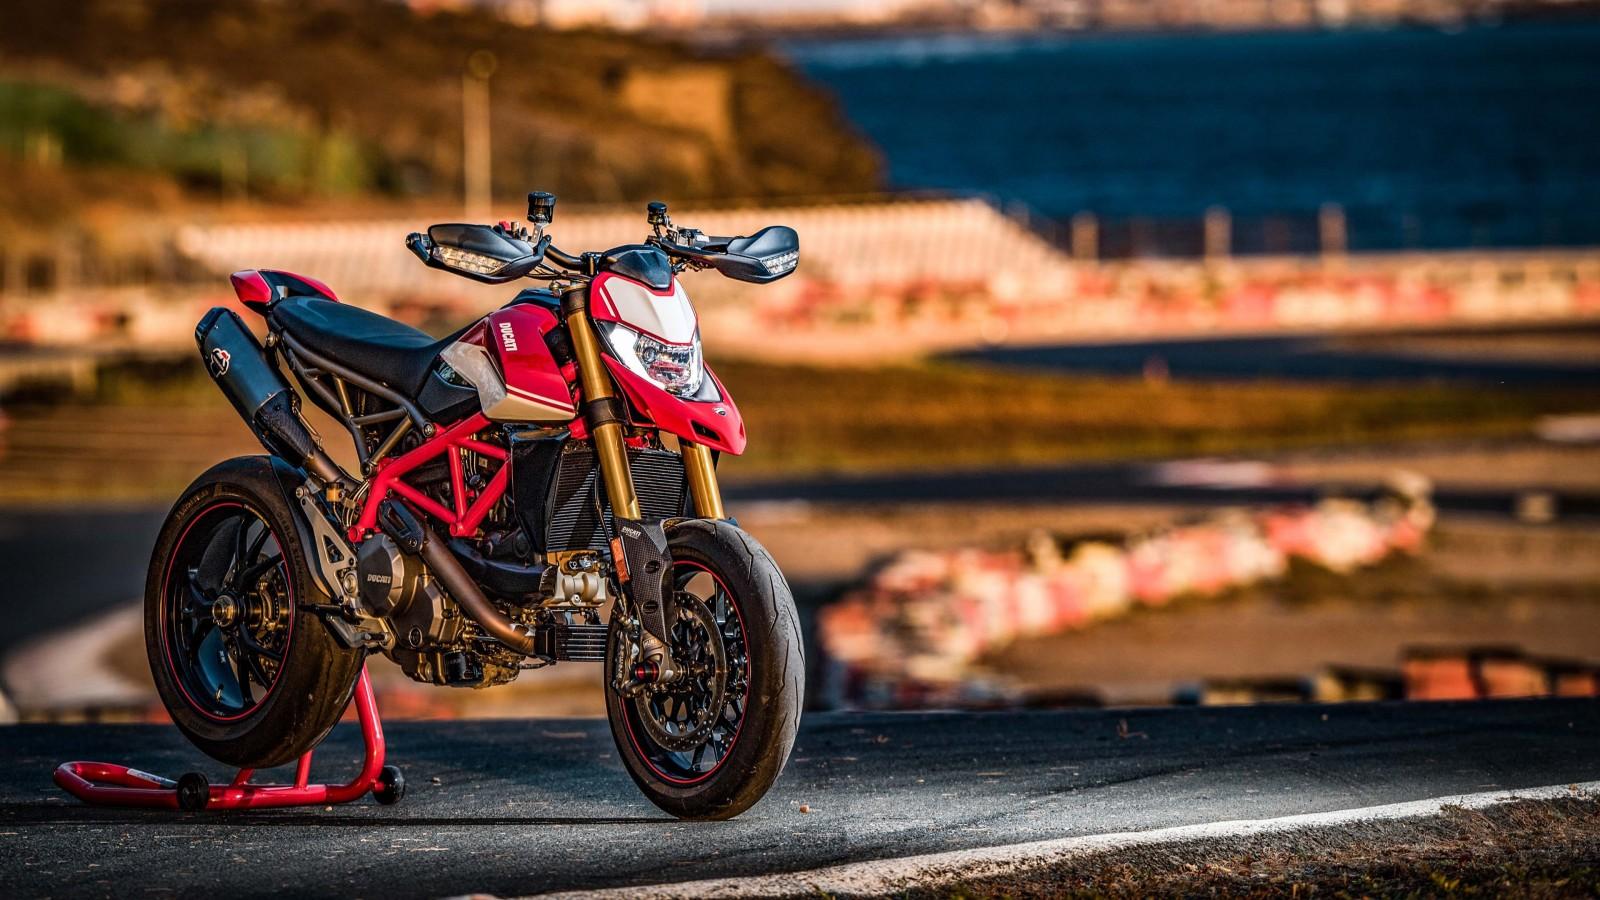 Top Iphone Wallpapers Hd Ducati Hypermotard 950 Sp 2019 4k Wallpapers Hd